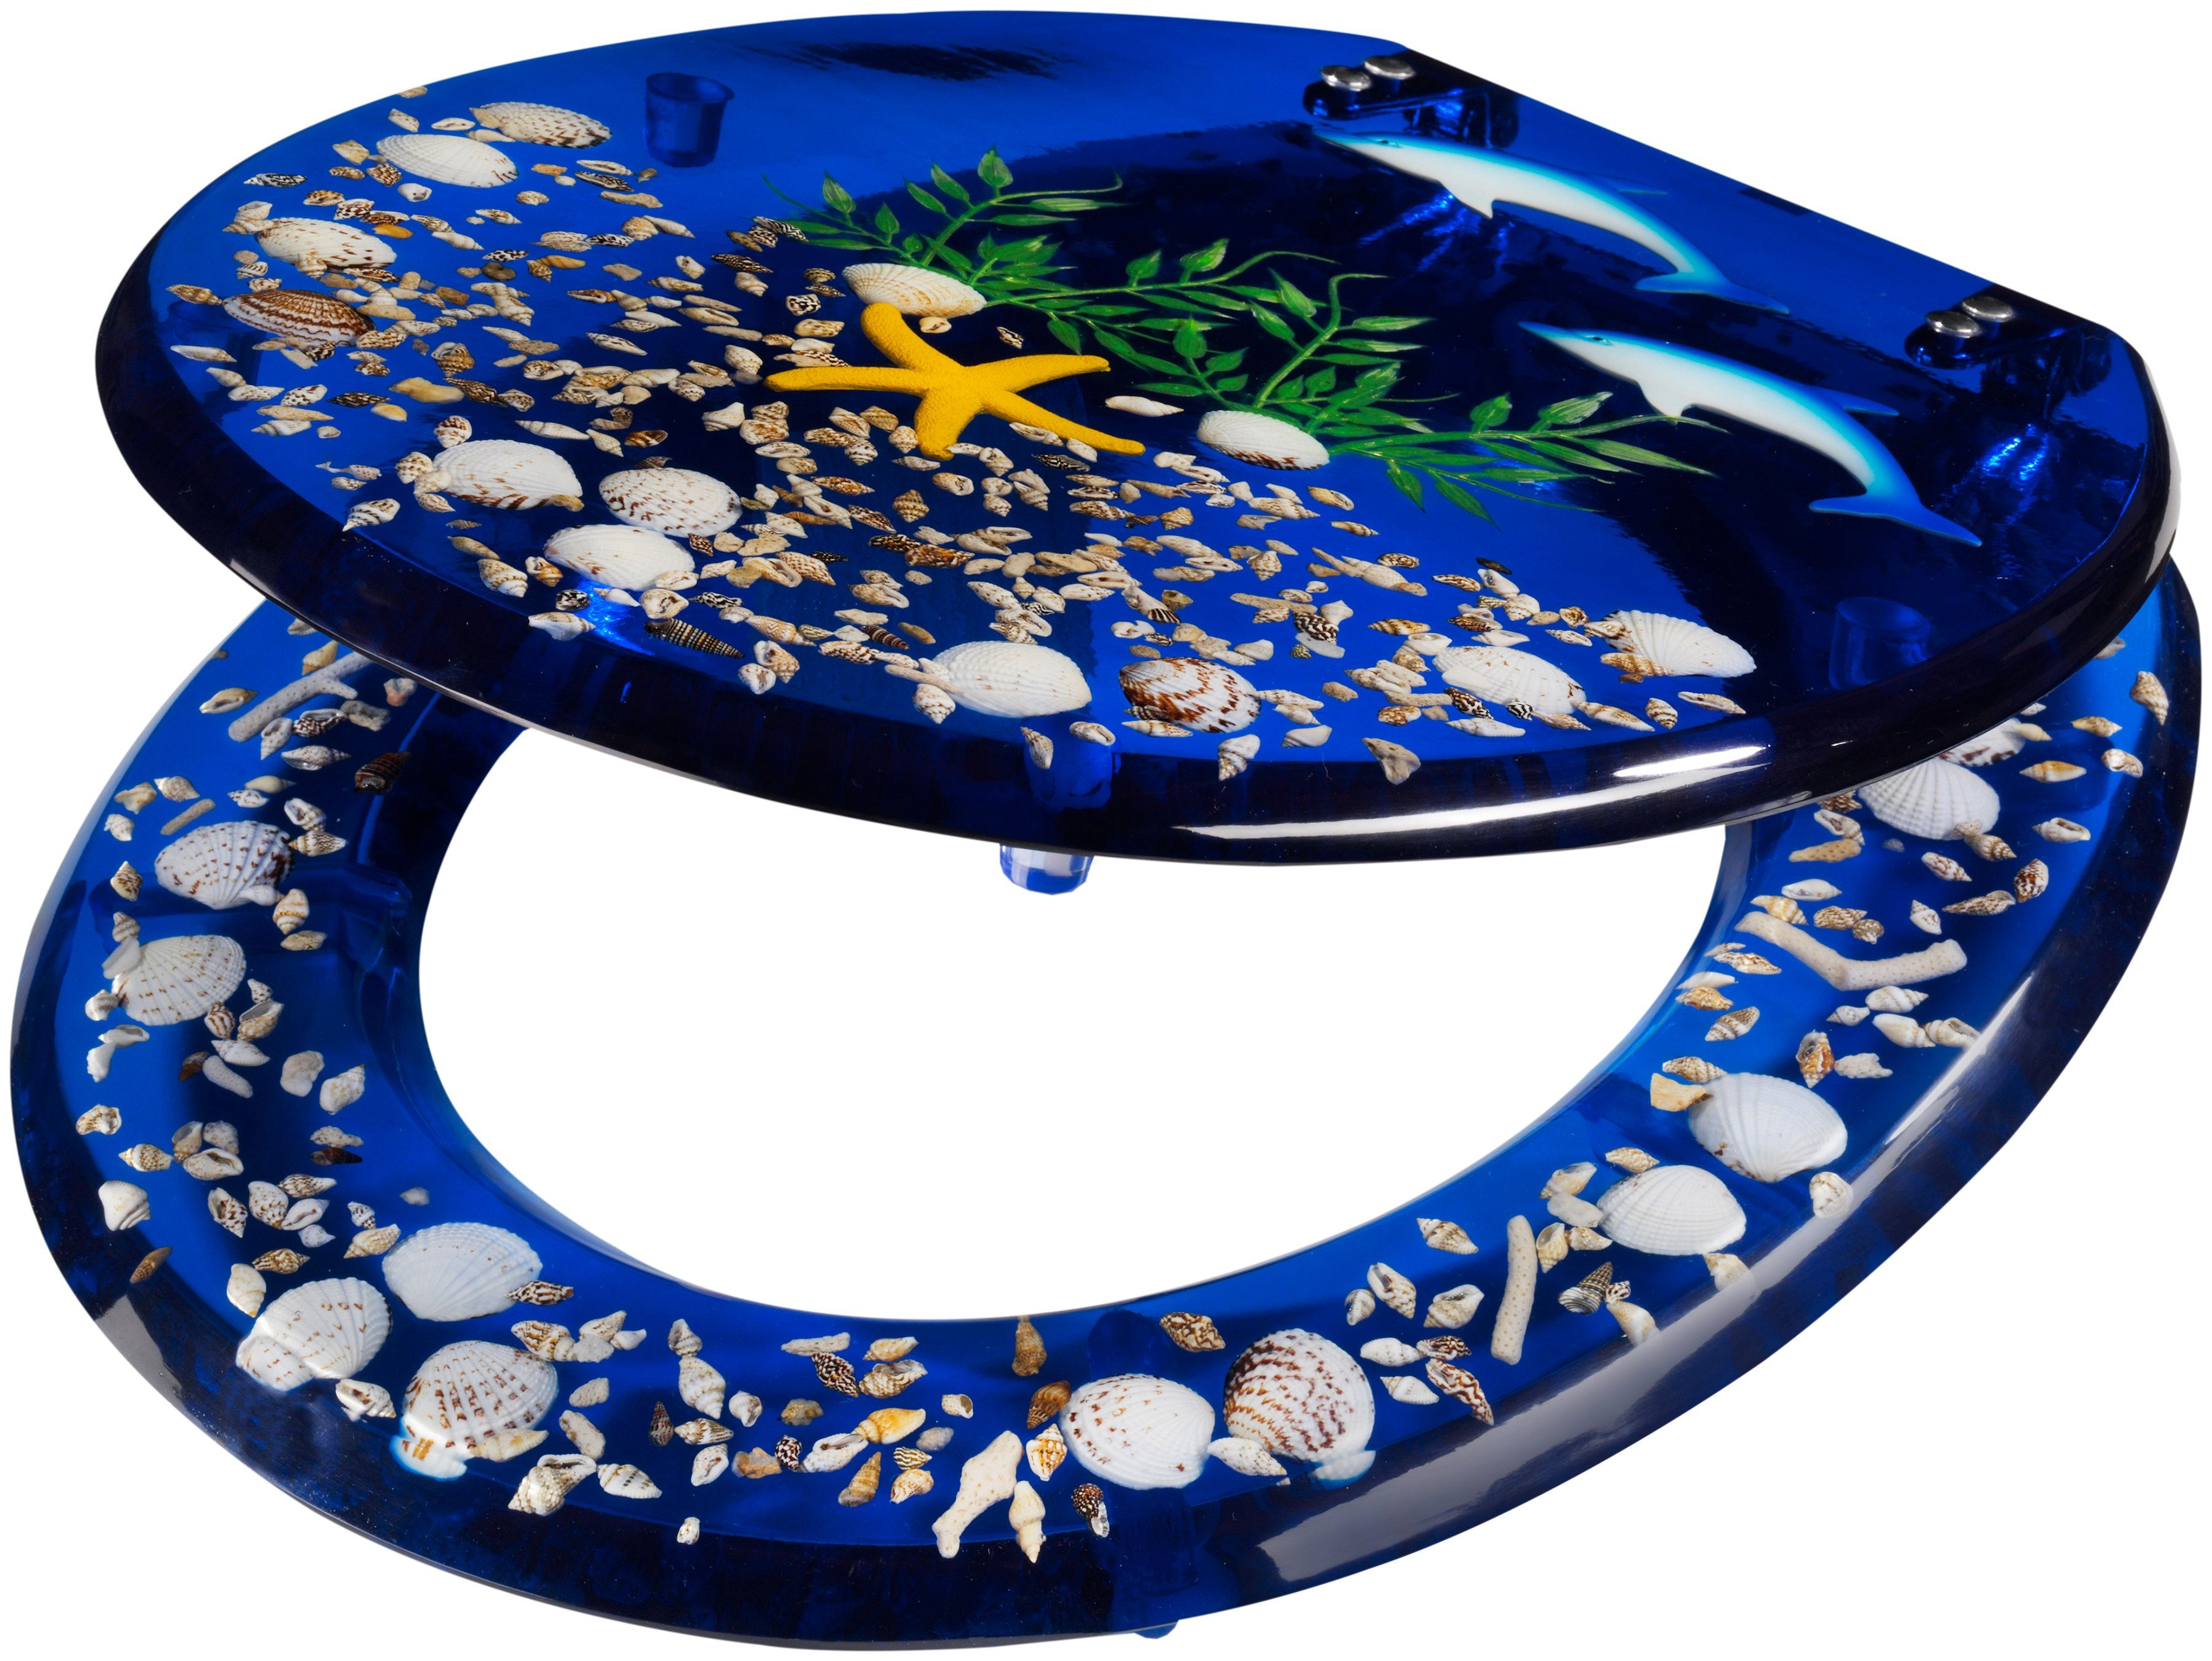 WC-Sitz »Delfin«, Toilettensitz mit eigelegten Meeresmotiven